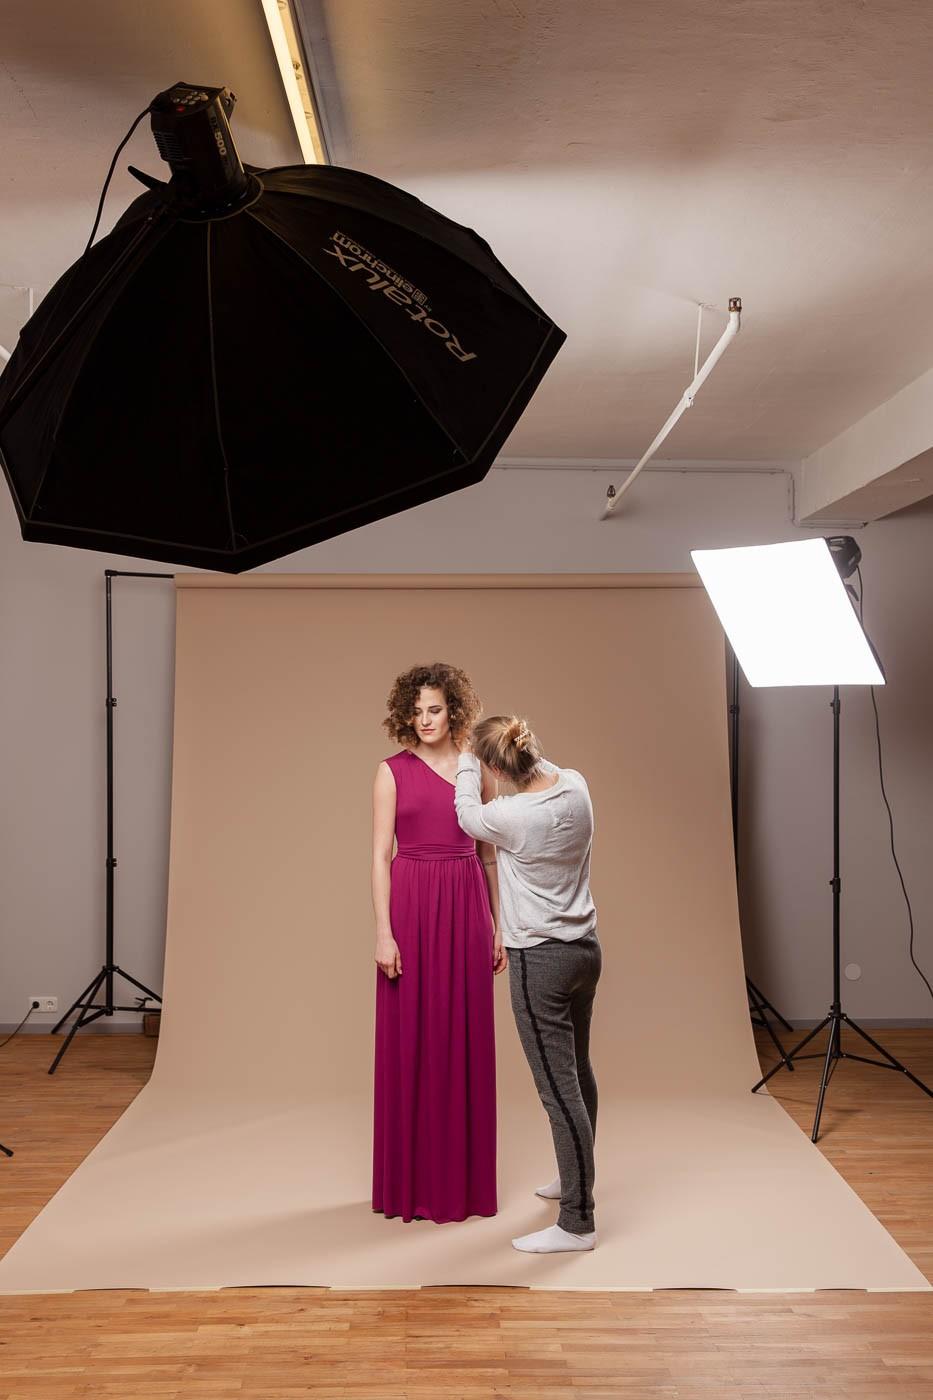 making-of-visagistin-fashionfotos-fashionphotography-fotoshooting-fotostudio-absam-tirol